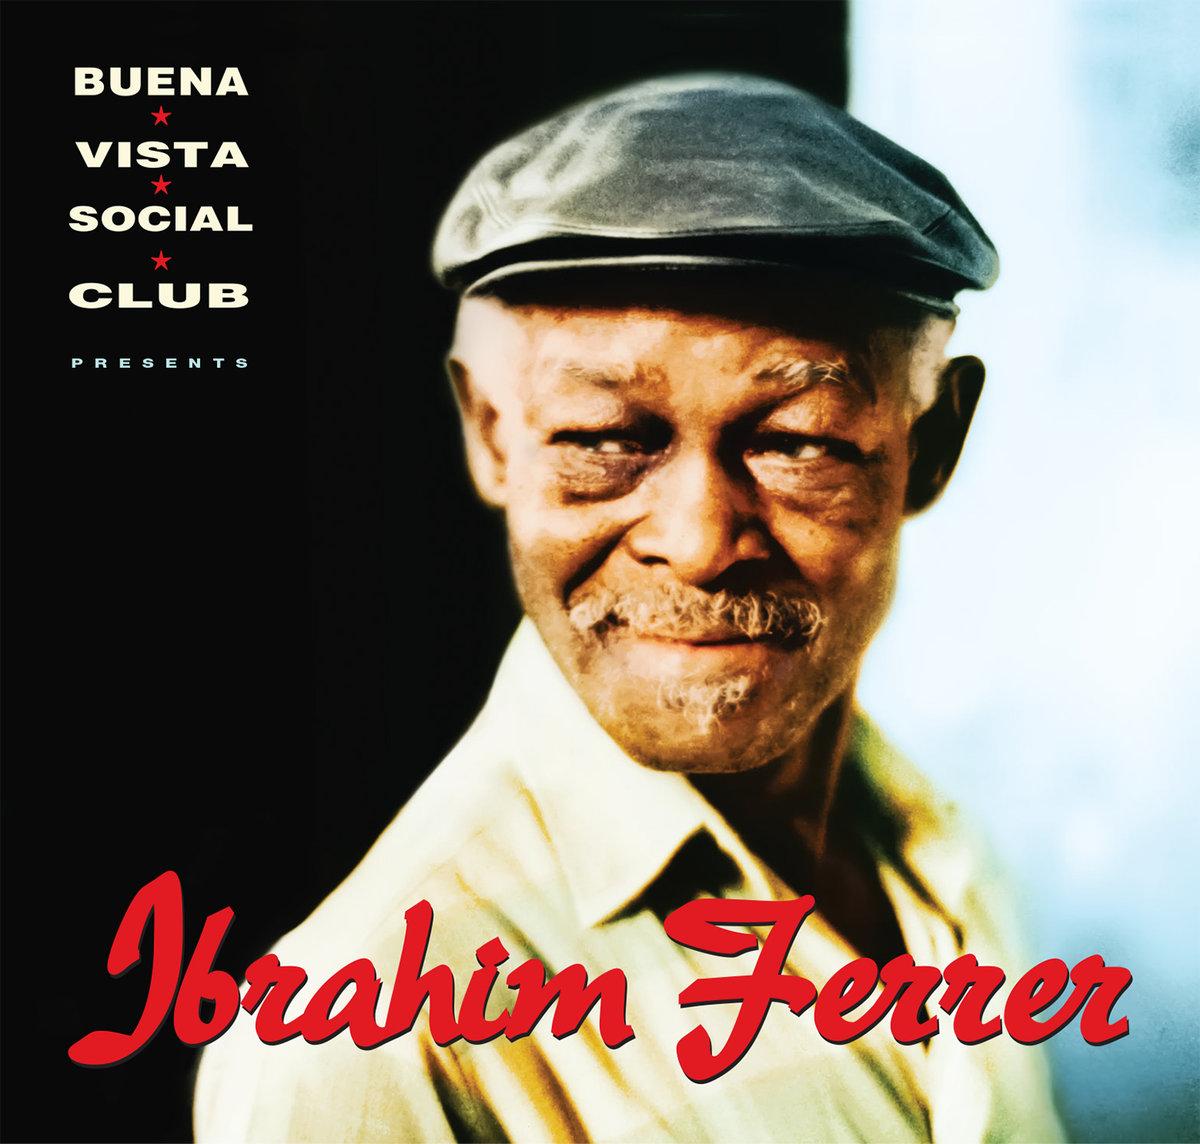 Ibrahim Ferrer - Buena Vista Social Club presents Ibrahim Ferrer (2xLP) - World Circuit Records